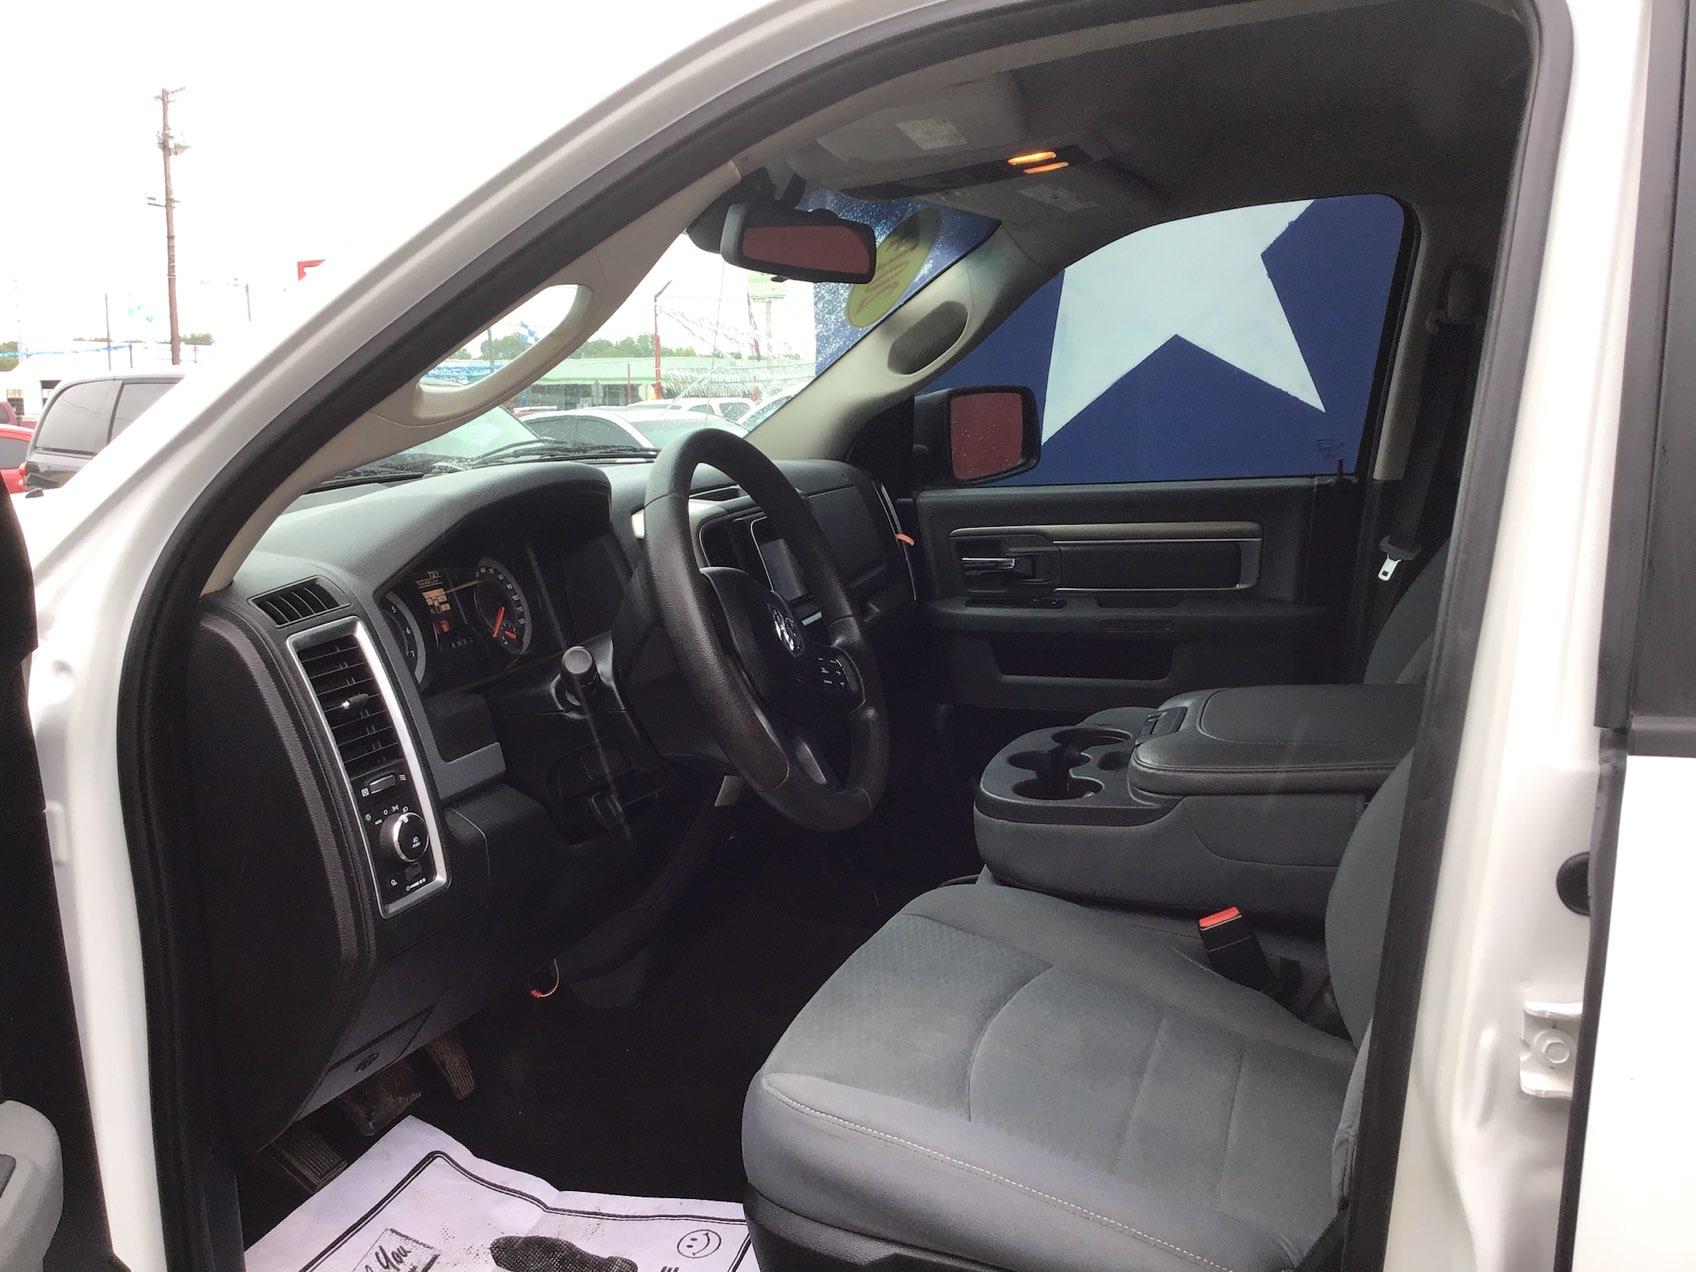 used vehicle - Truck RAM 1500 2014